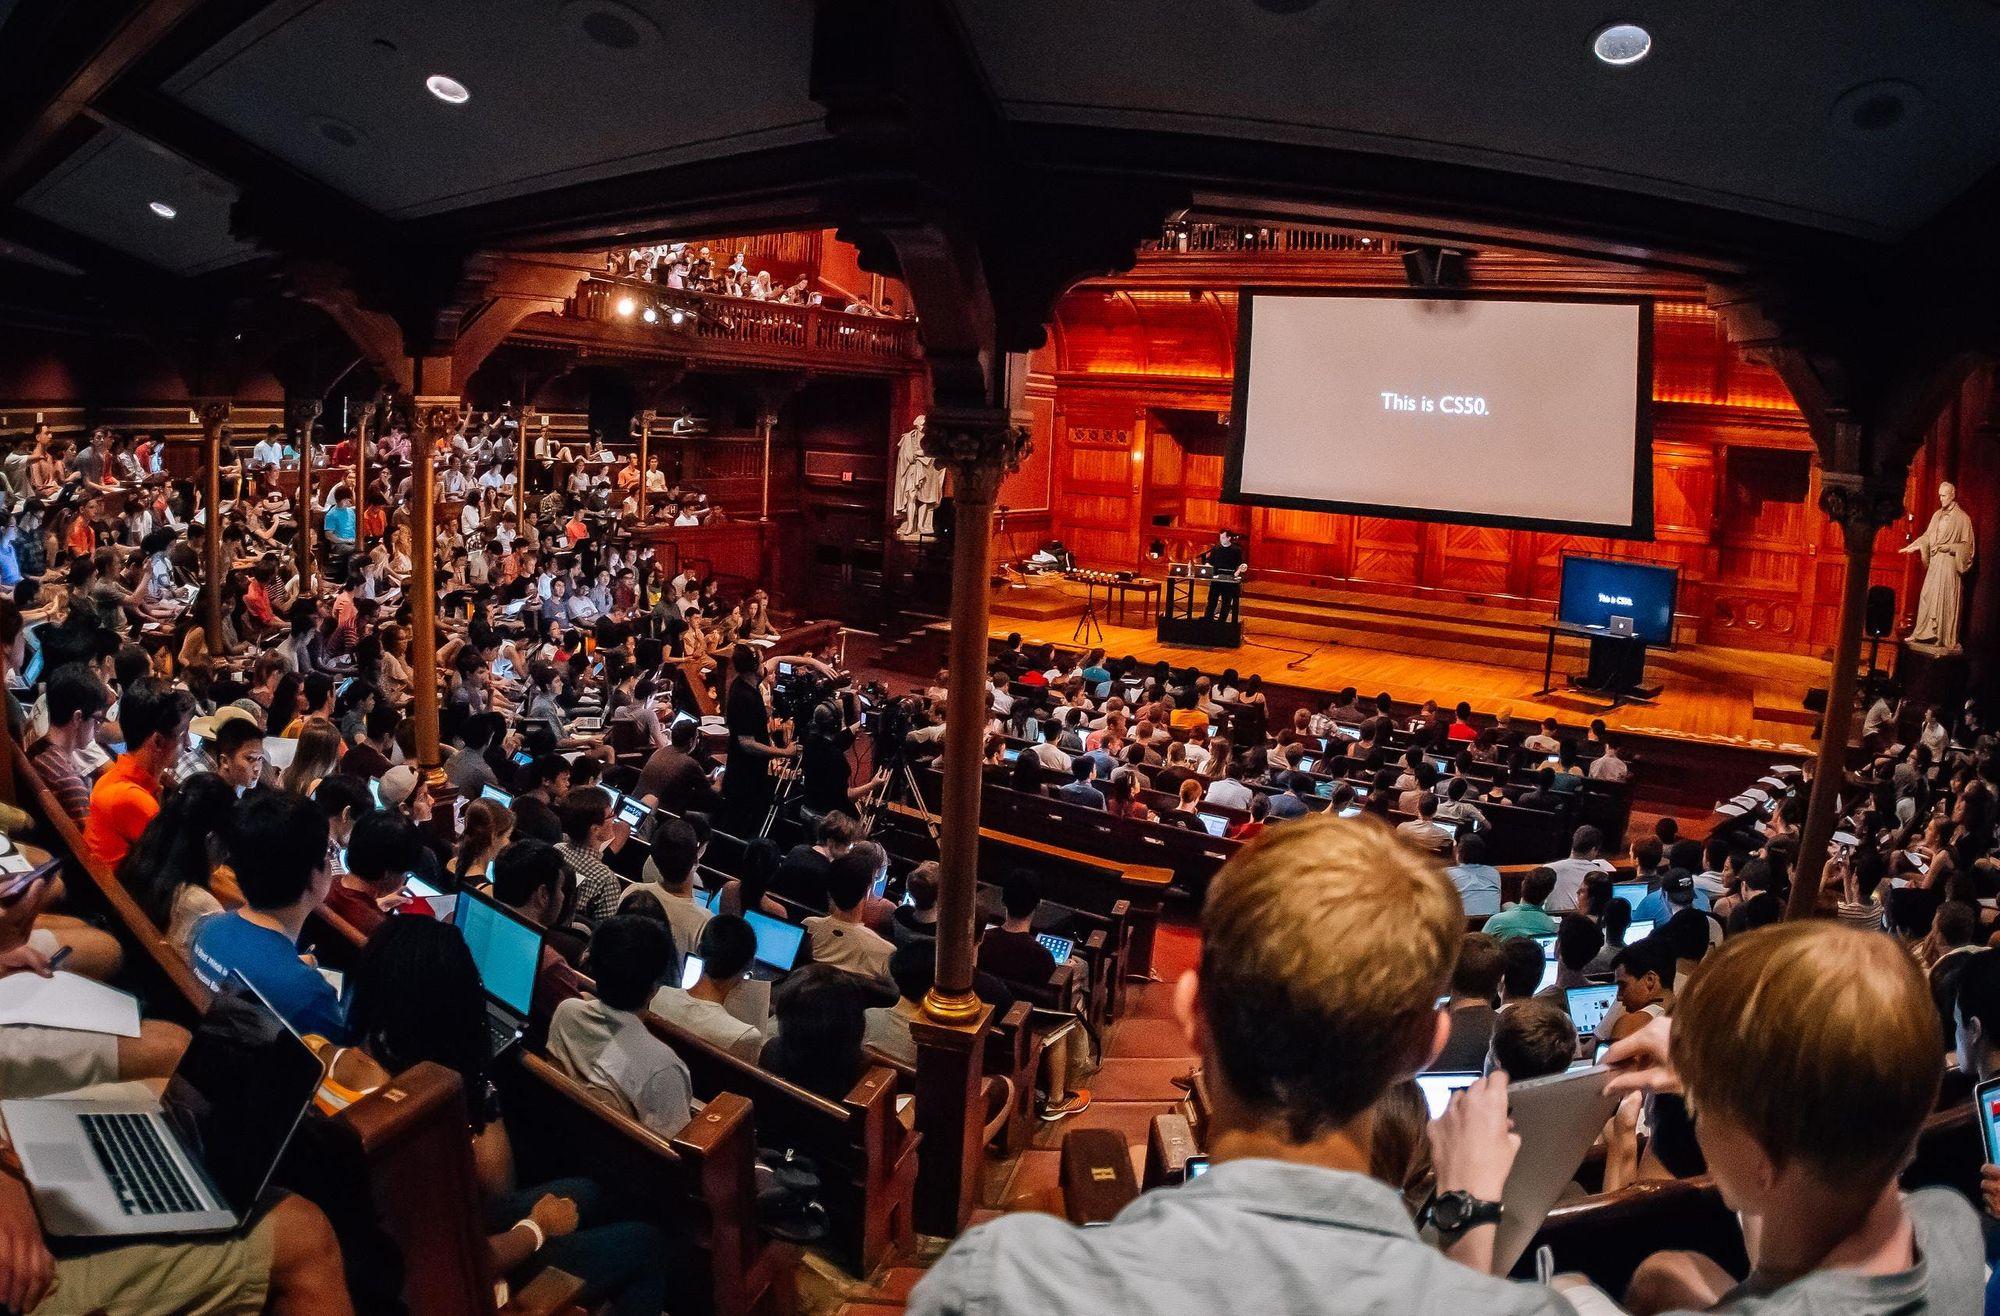 CS50 in Harvard's Sanders Theater